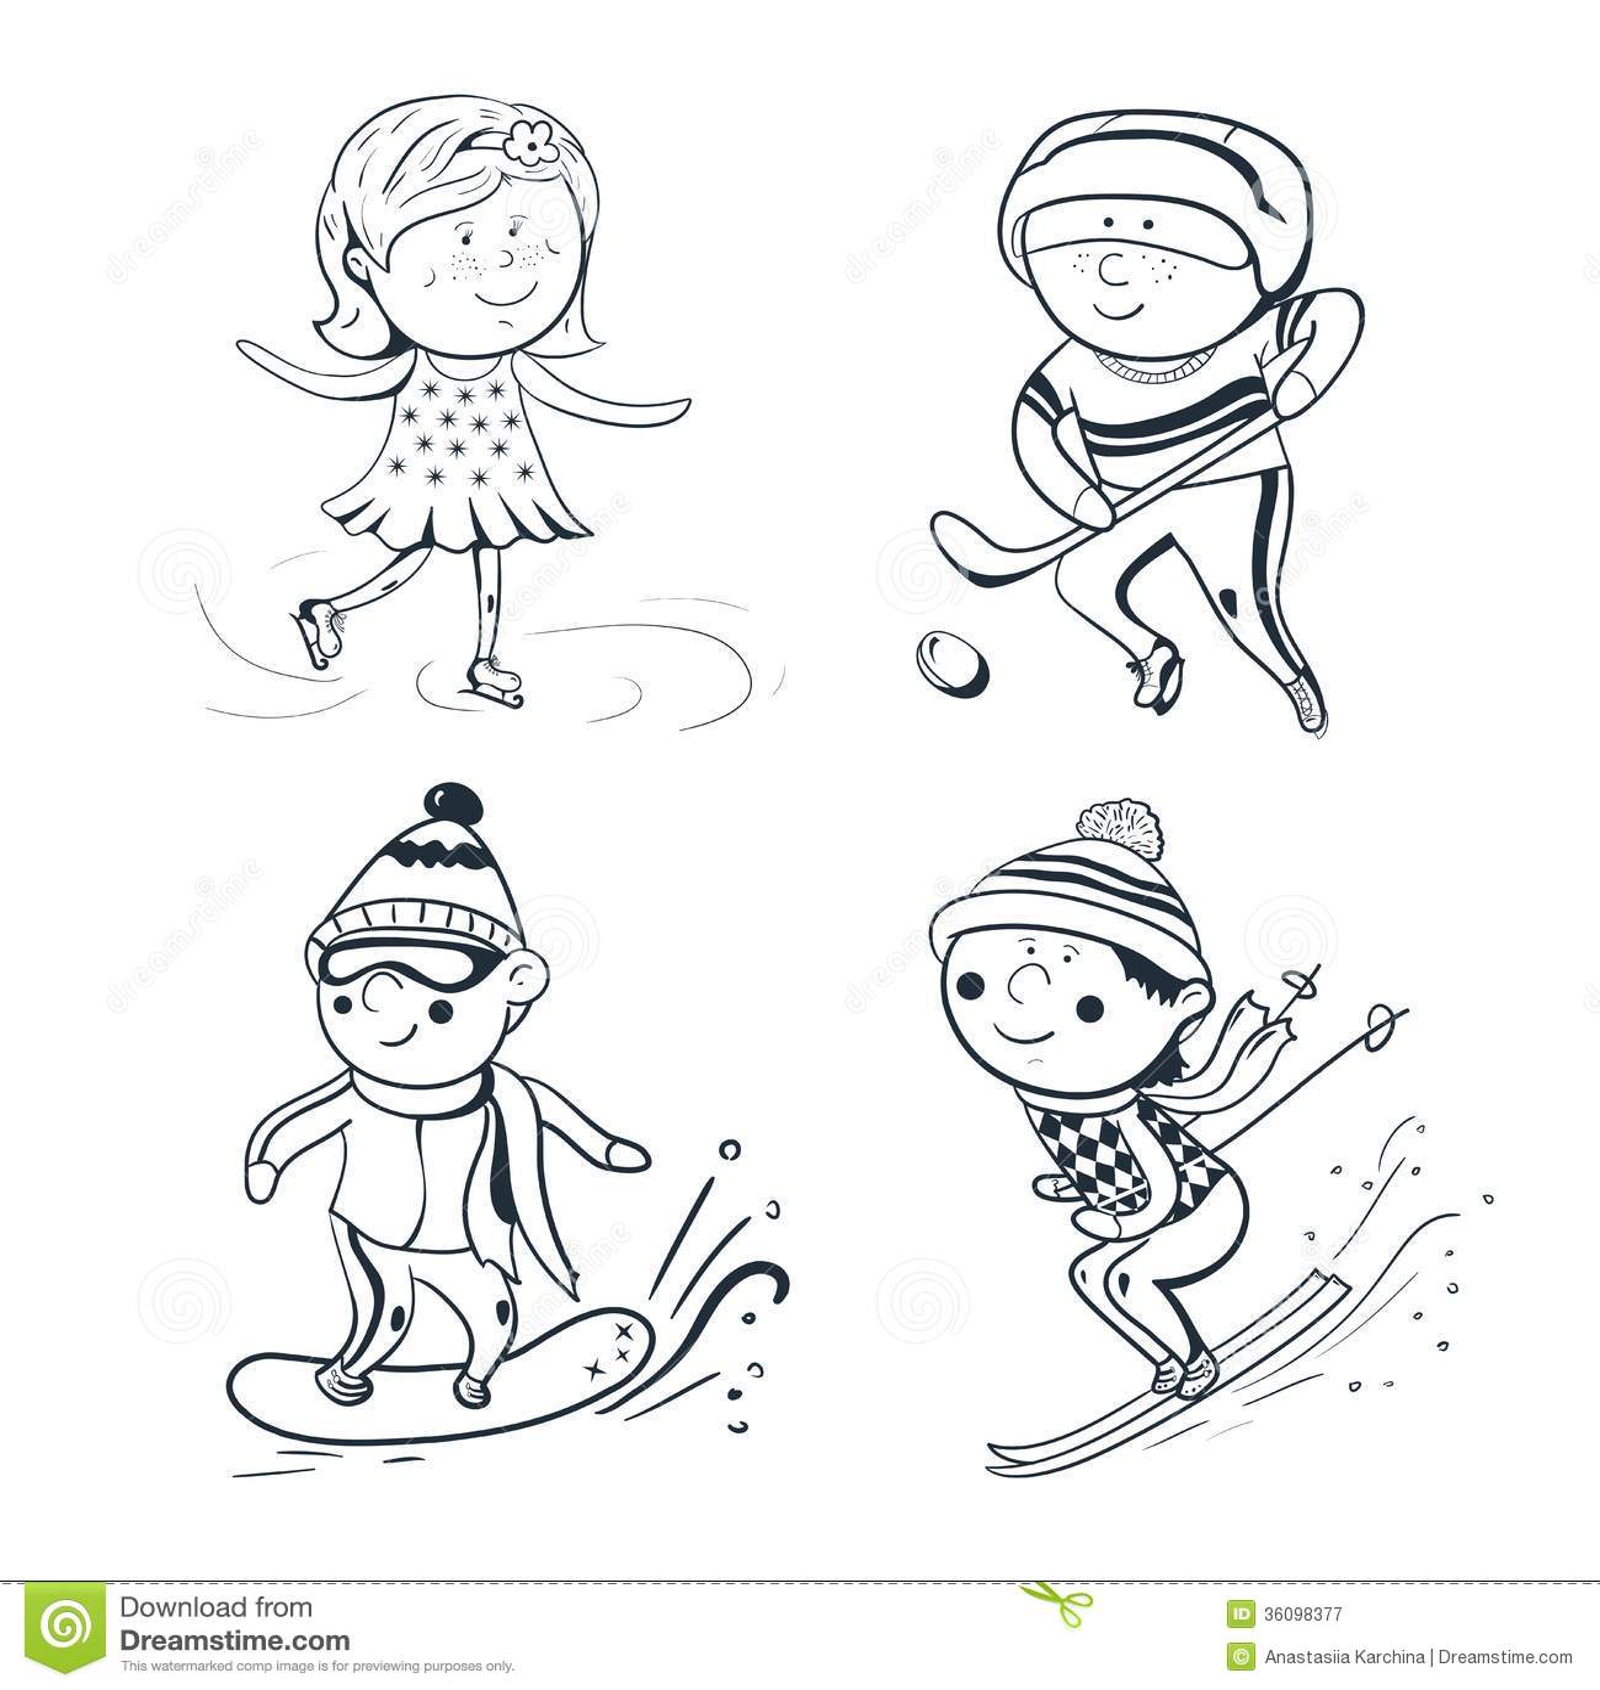 Winter Sports Vector Sketch Sportsmen Royalty Free Stock